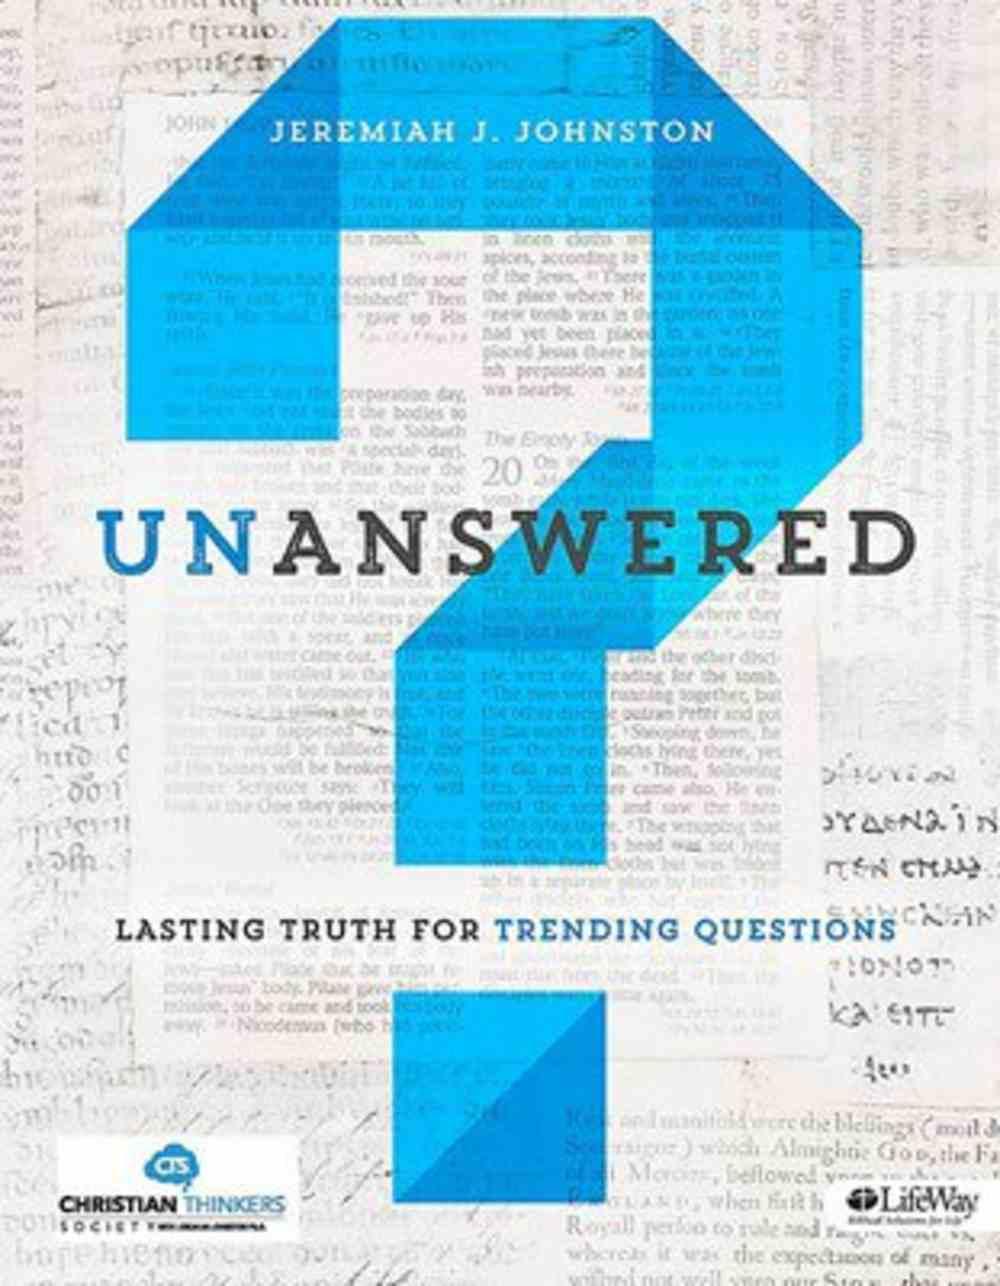 Unanswered (2 Dvds) (Dvd Only Set) DVD